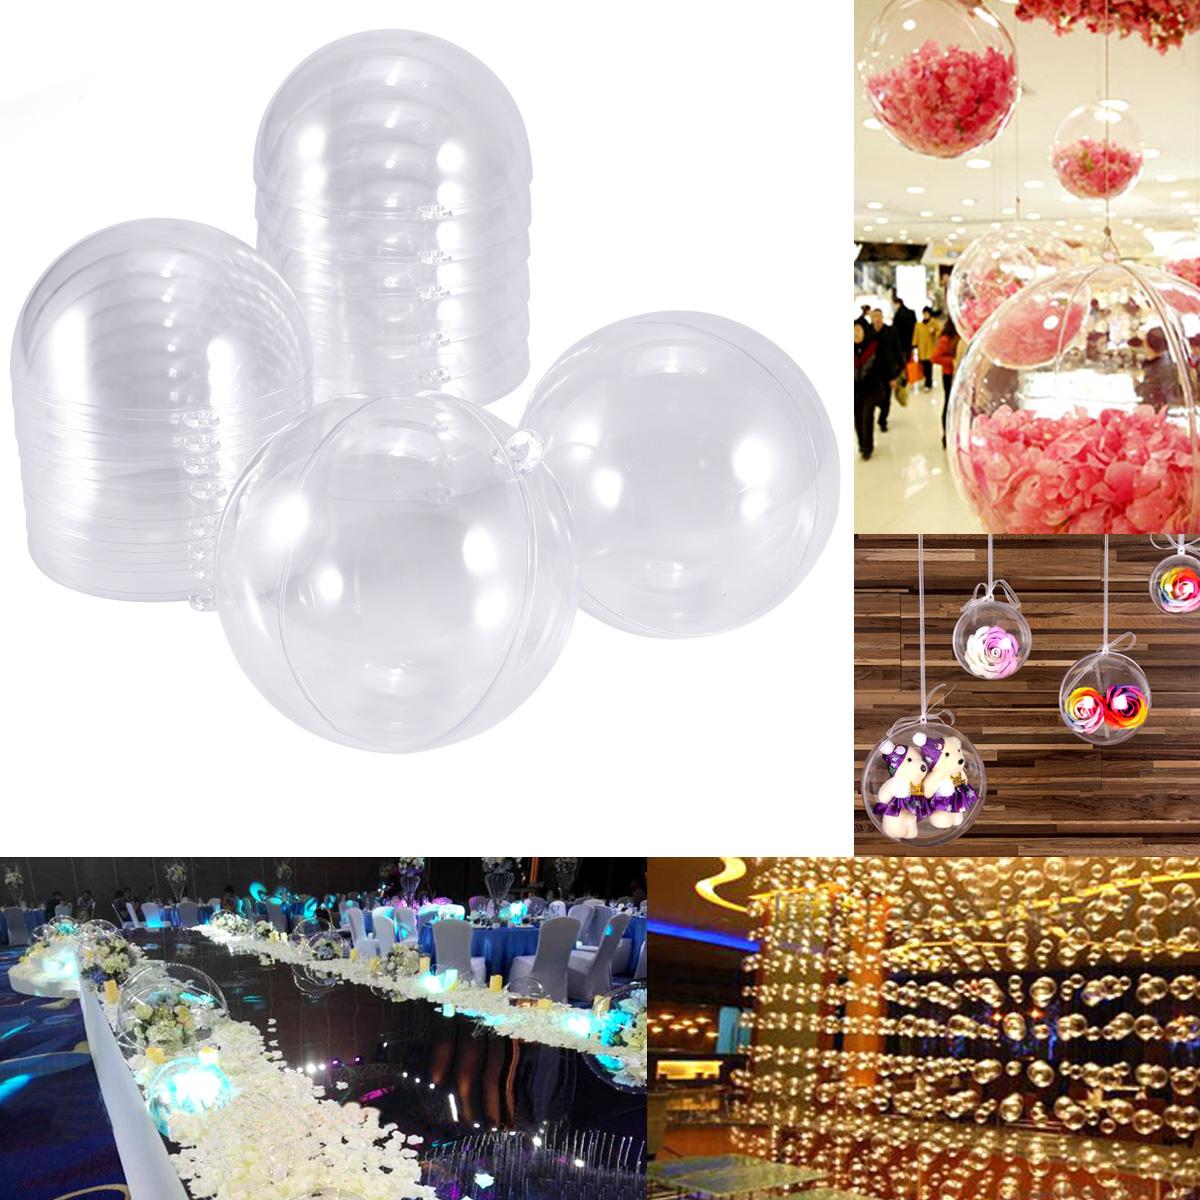 253206f0156 Bola de Navidad transparente para rellenar 10 12cm Bola de plástico ...